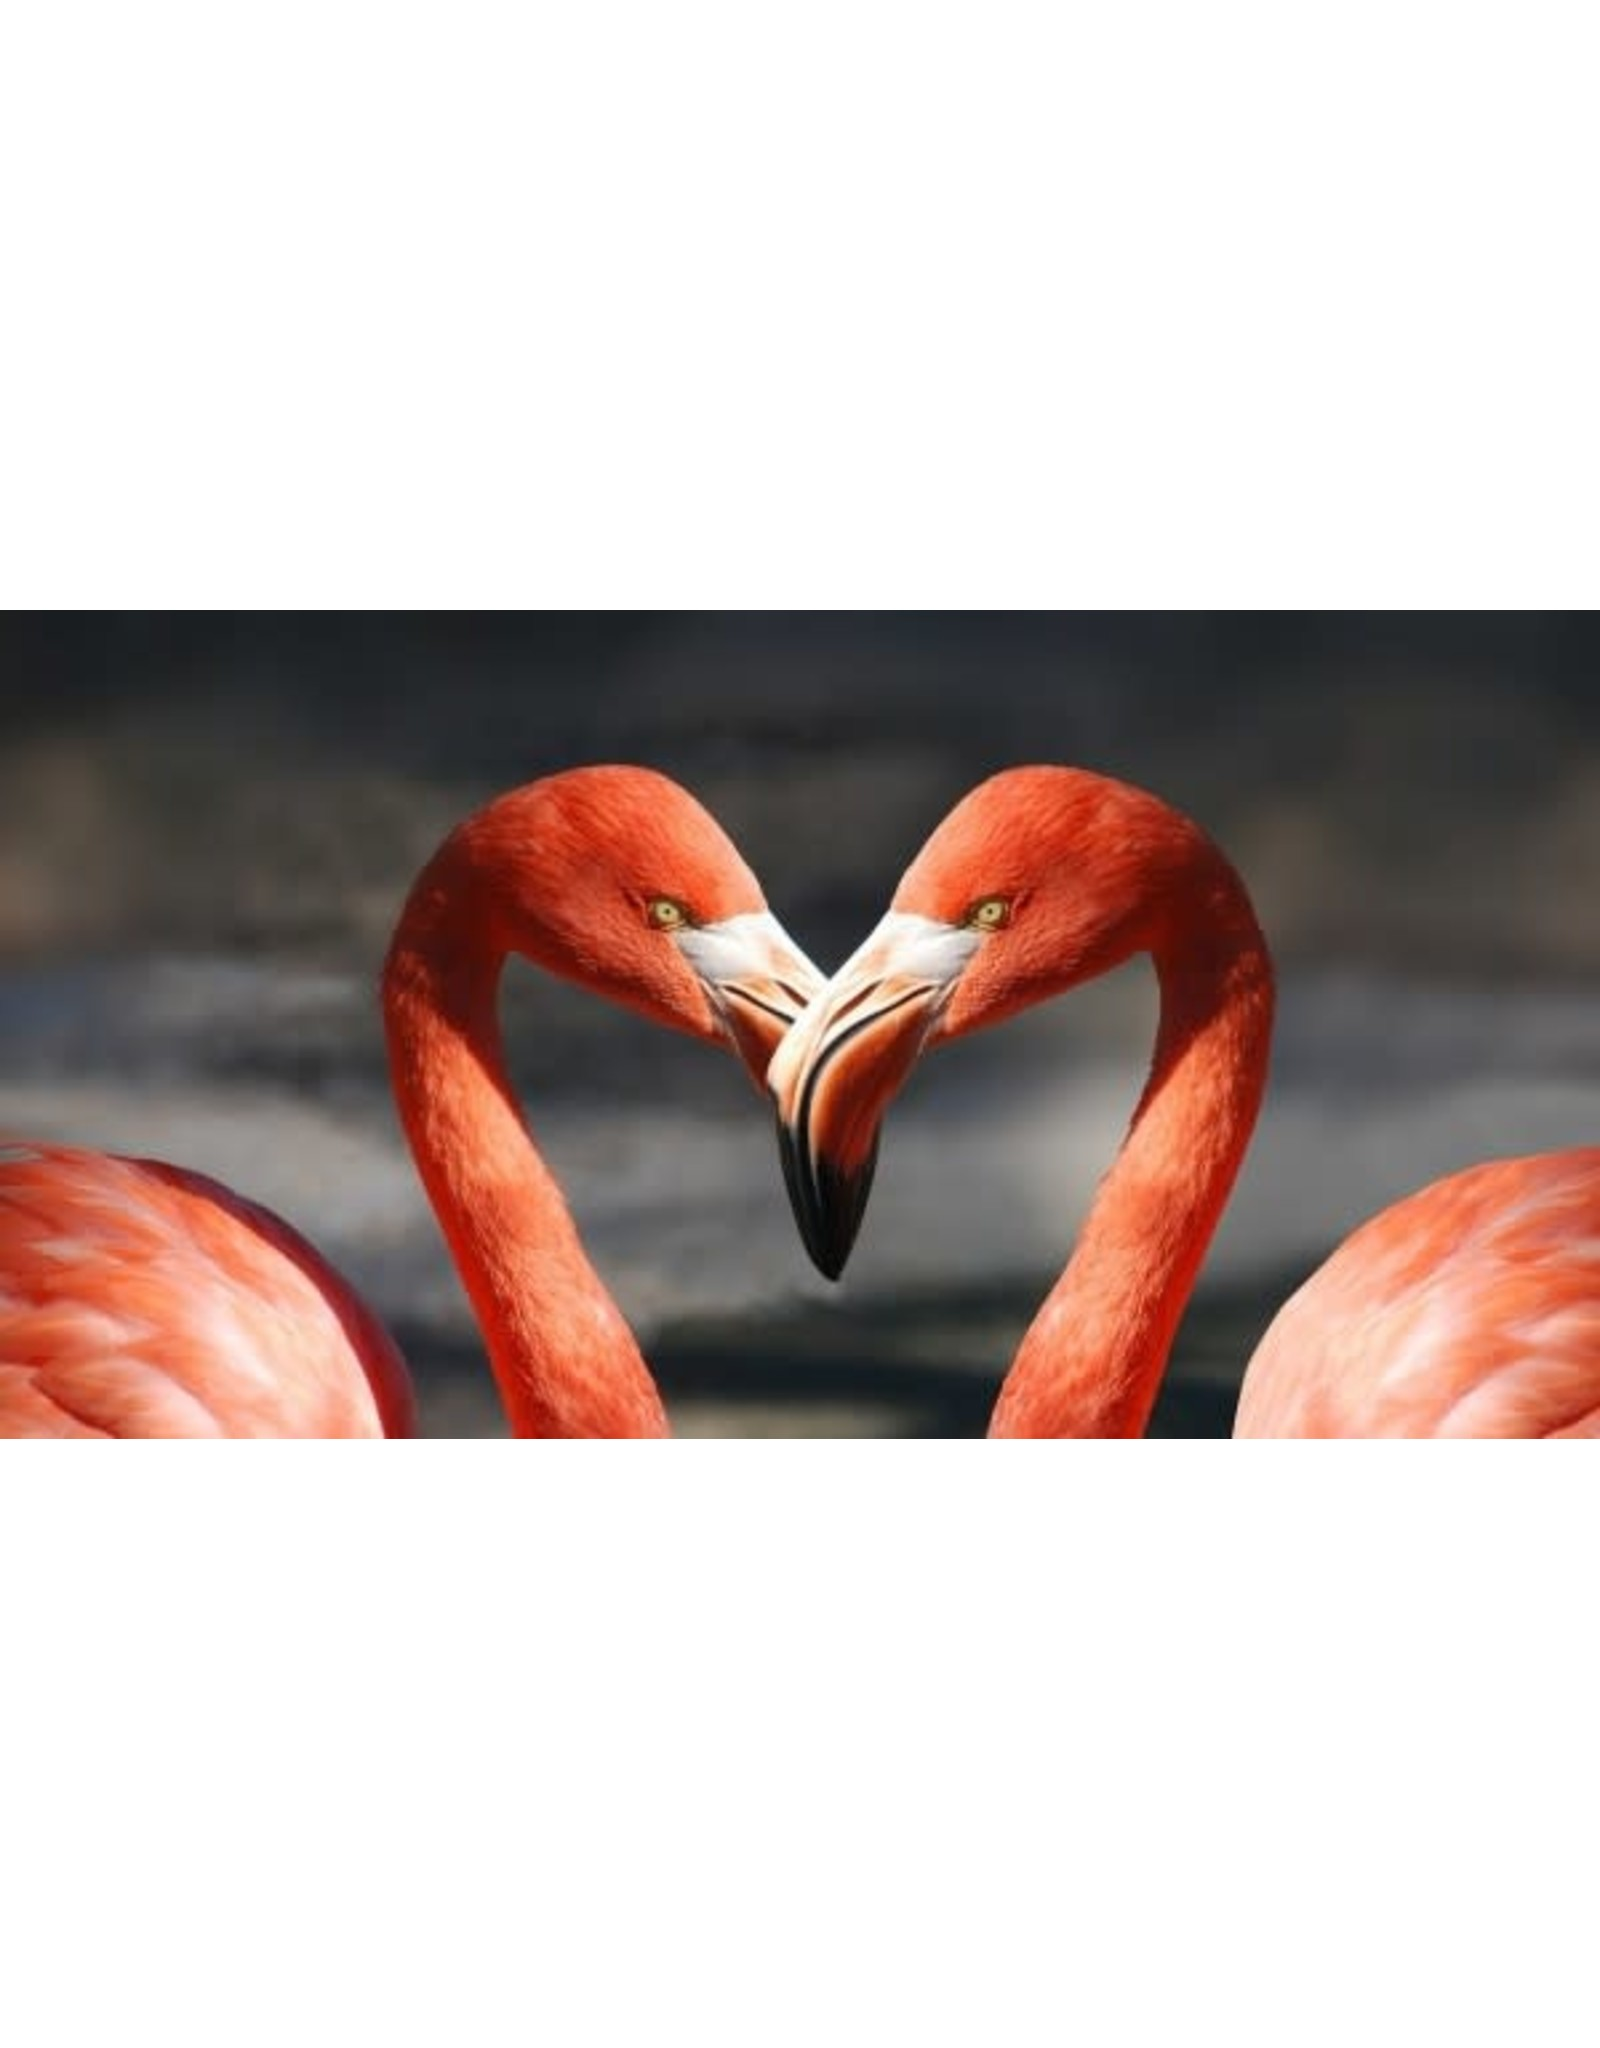 Diamond Painting flamingo XL 40x80cm